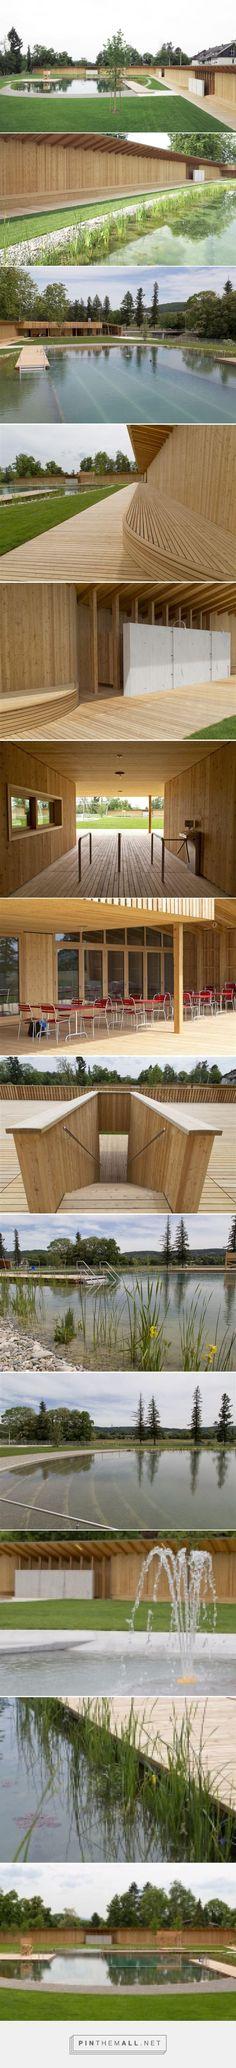 herzog & de meuron creates natural bathing pond for naturbad riehen - created via http://pinthemall.net